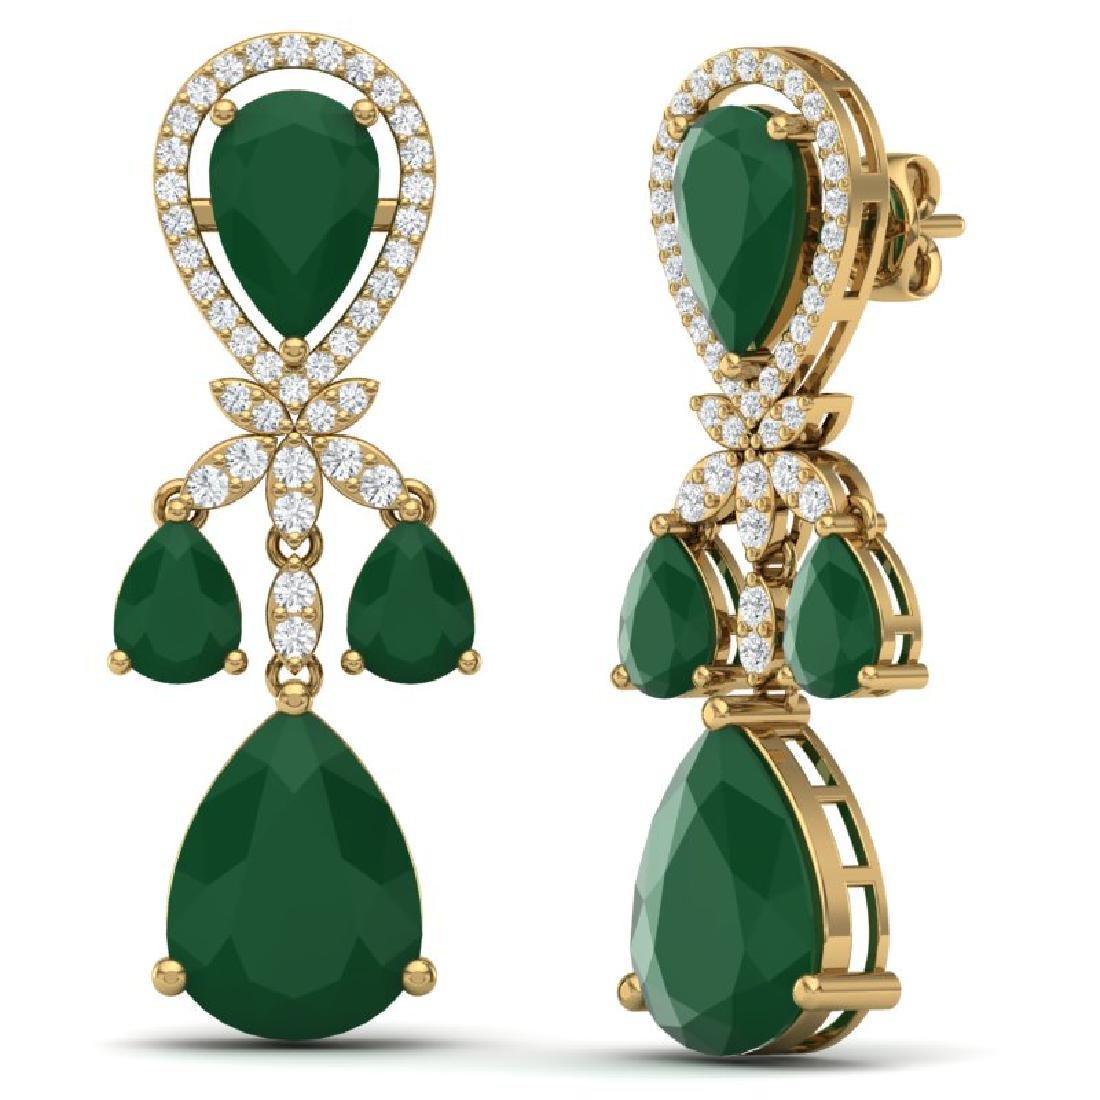 38.29 CTW Royalty Emerald & VS Diamond Earrings 18K - 3